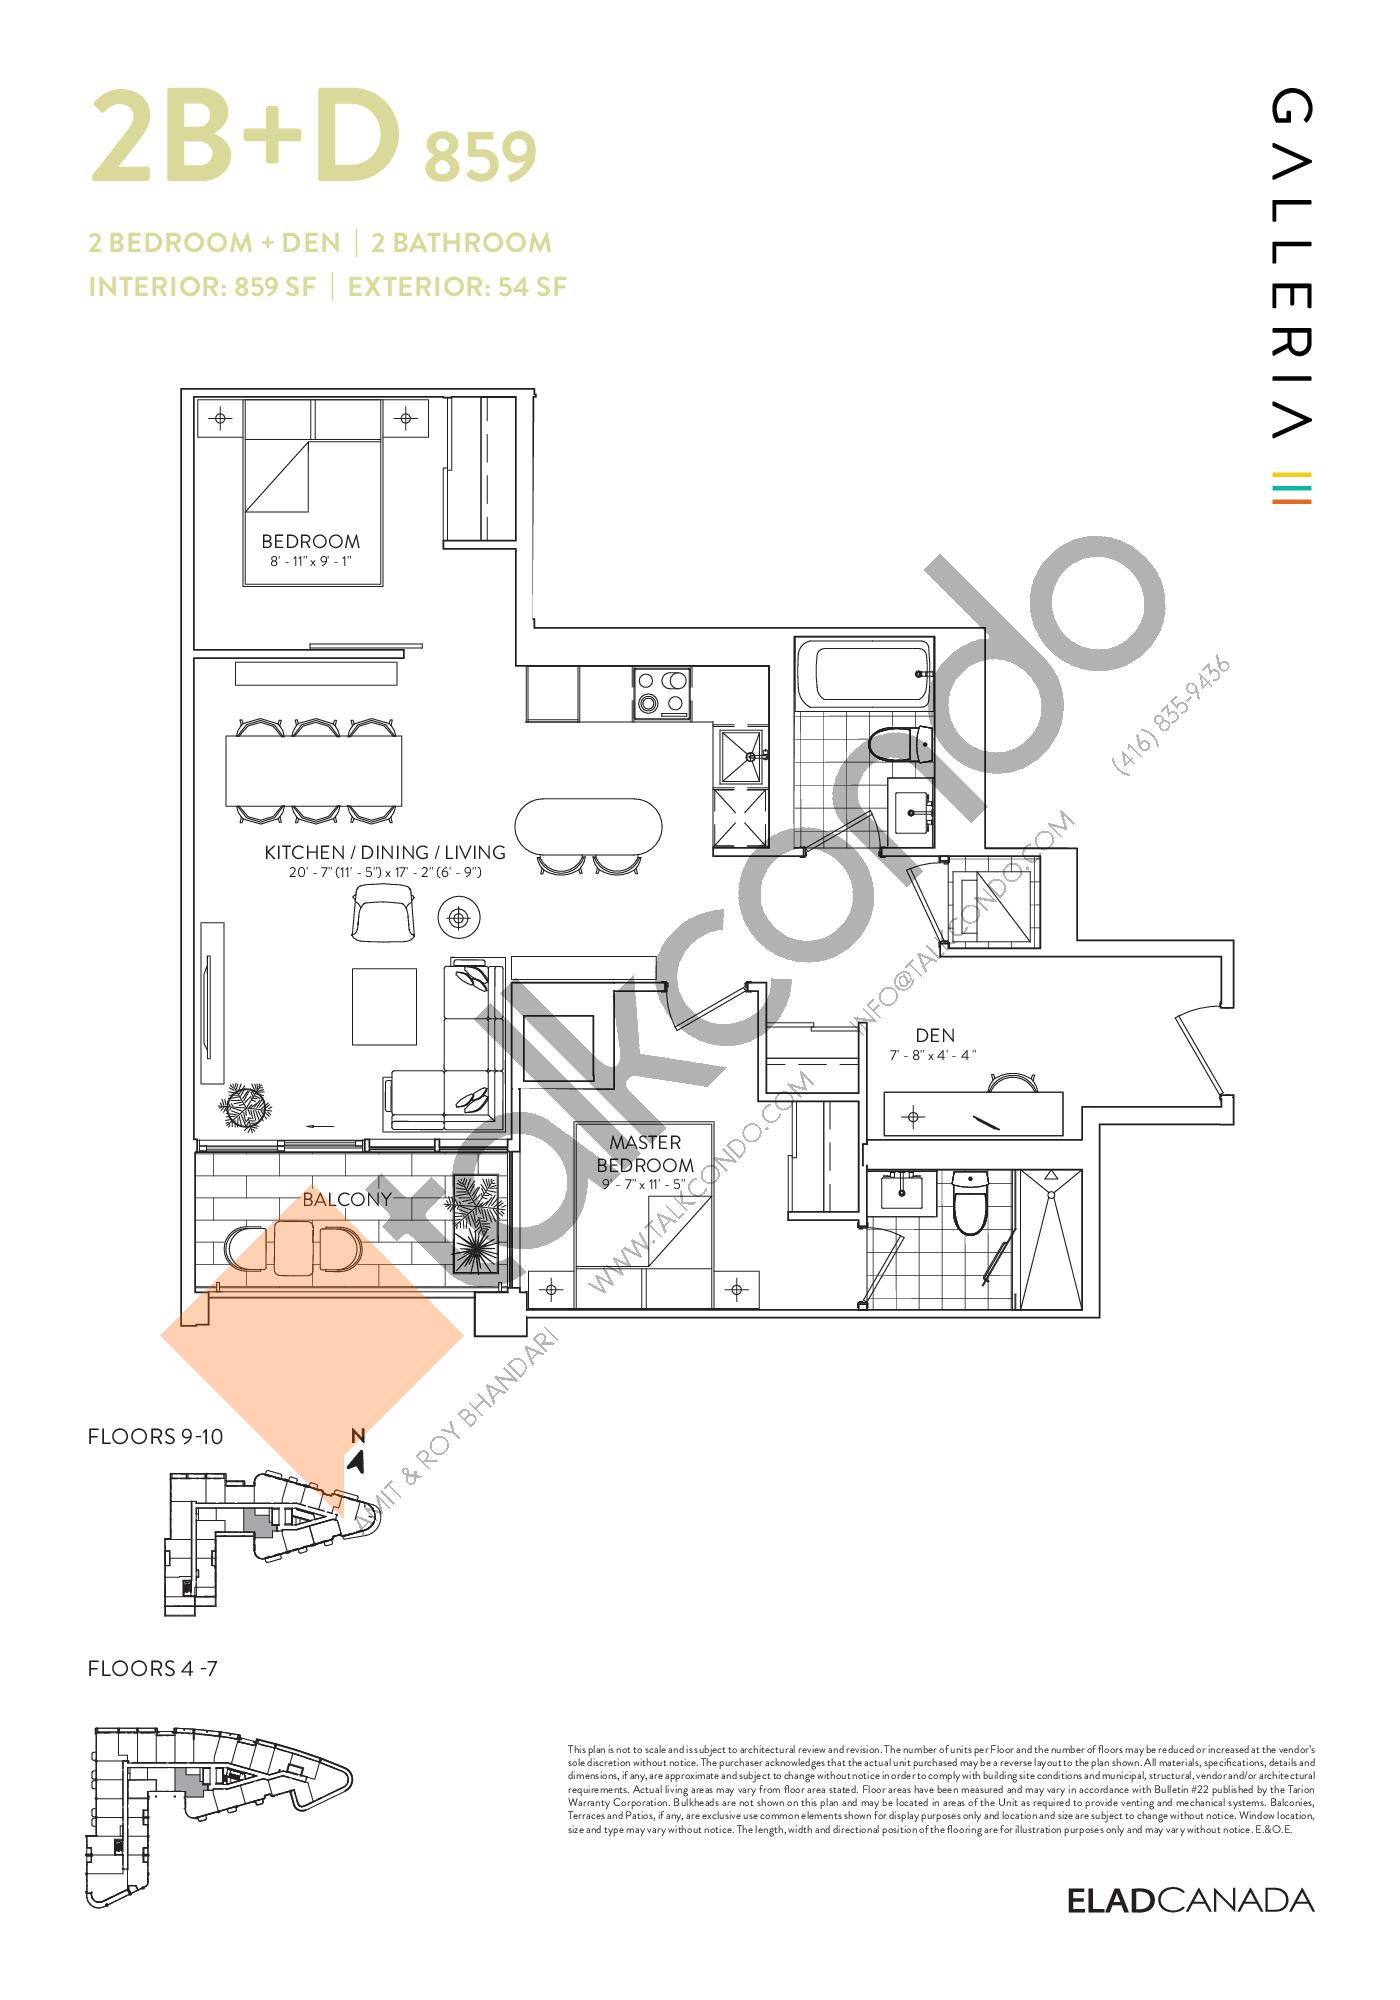 2B+D 859 Floor Plan at Galleria 03 Condos - 859 sq.ft